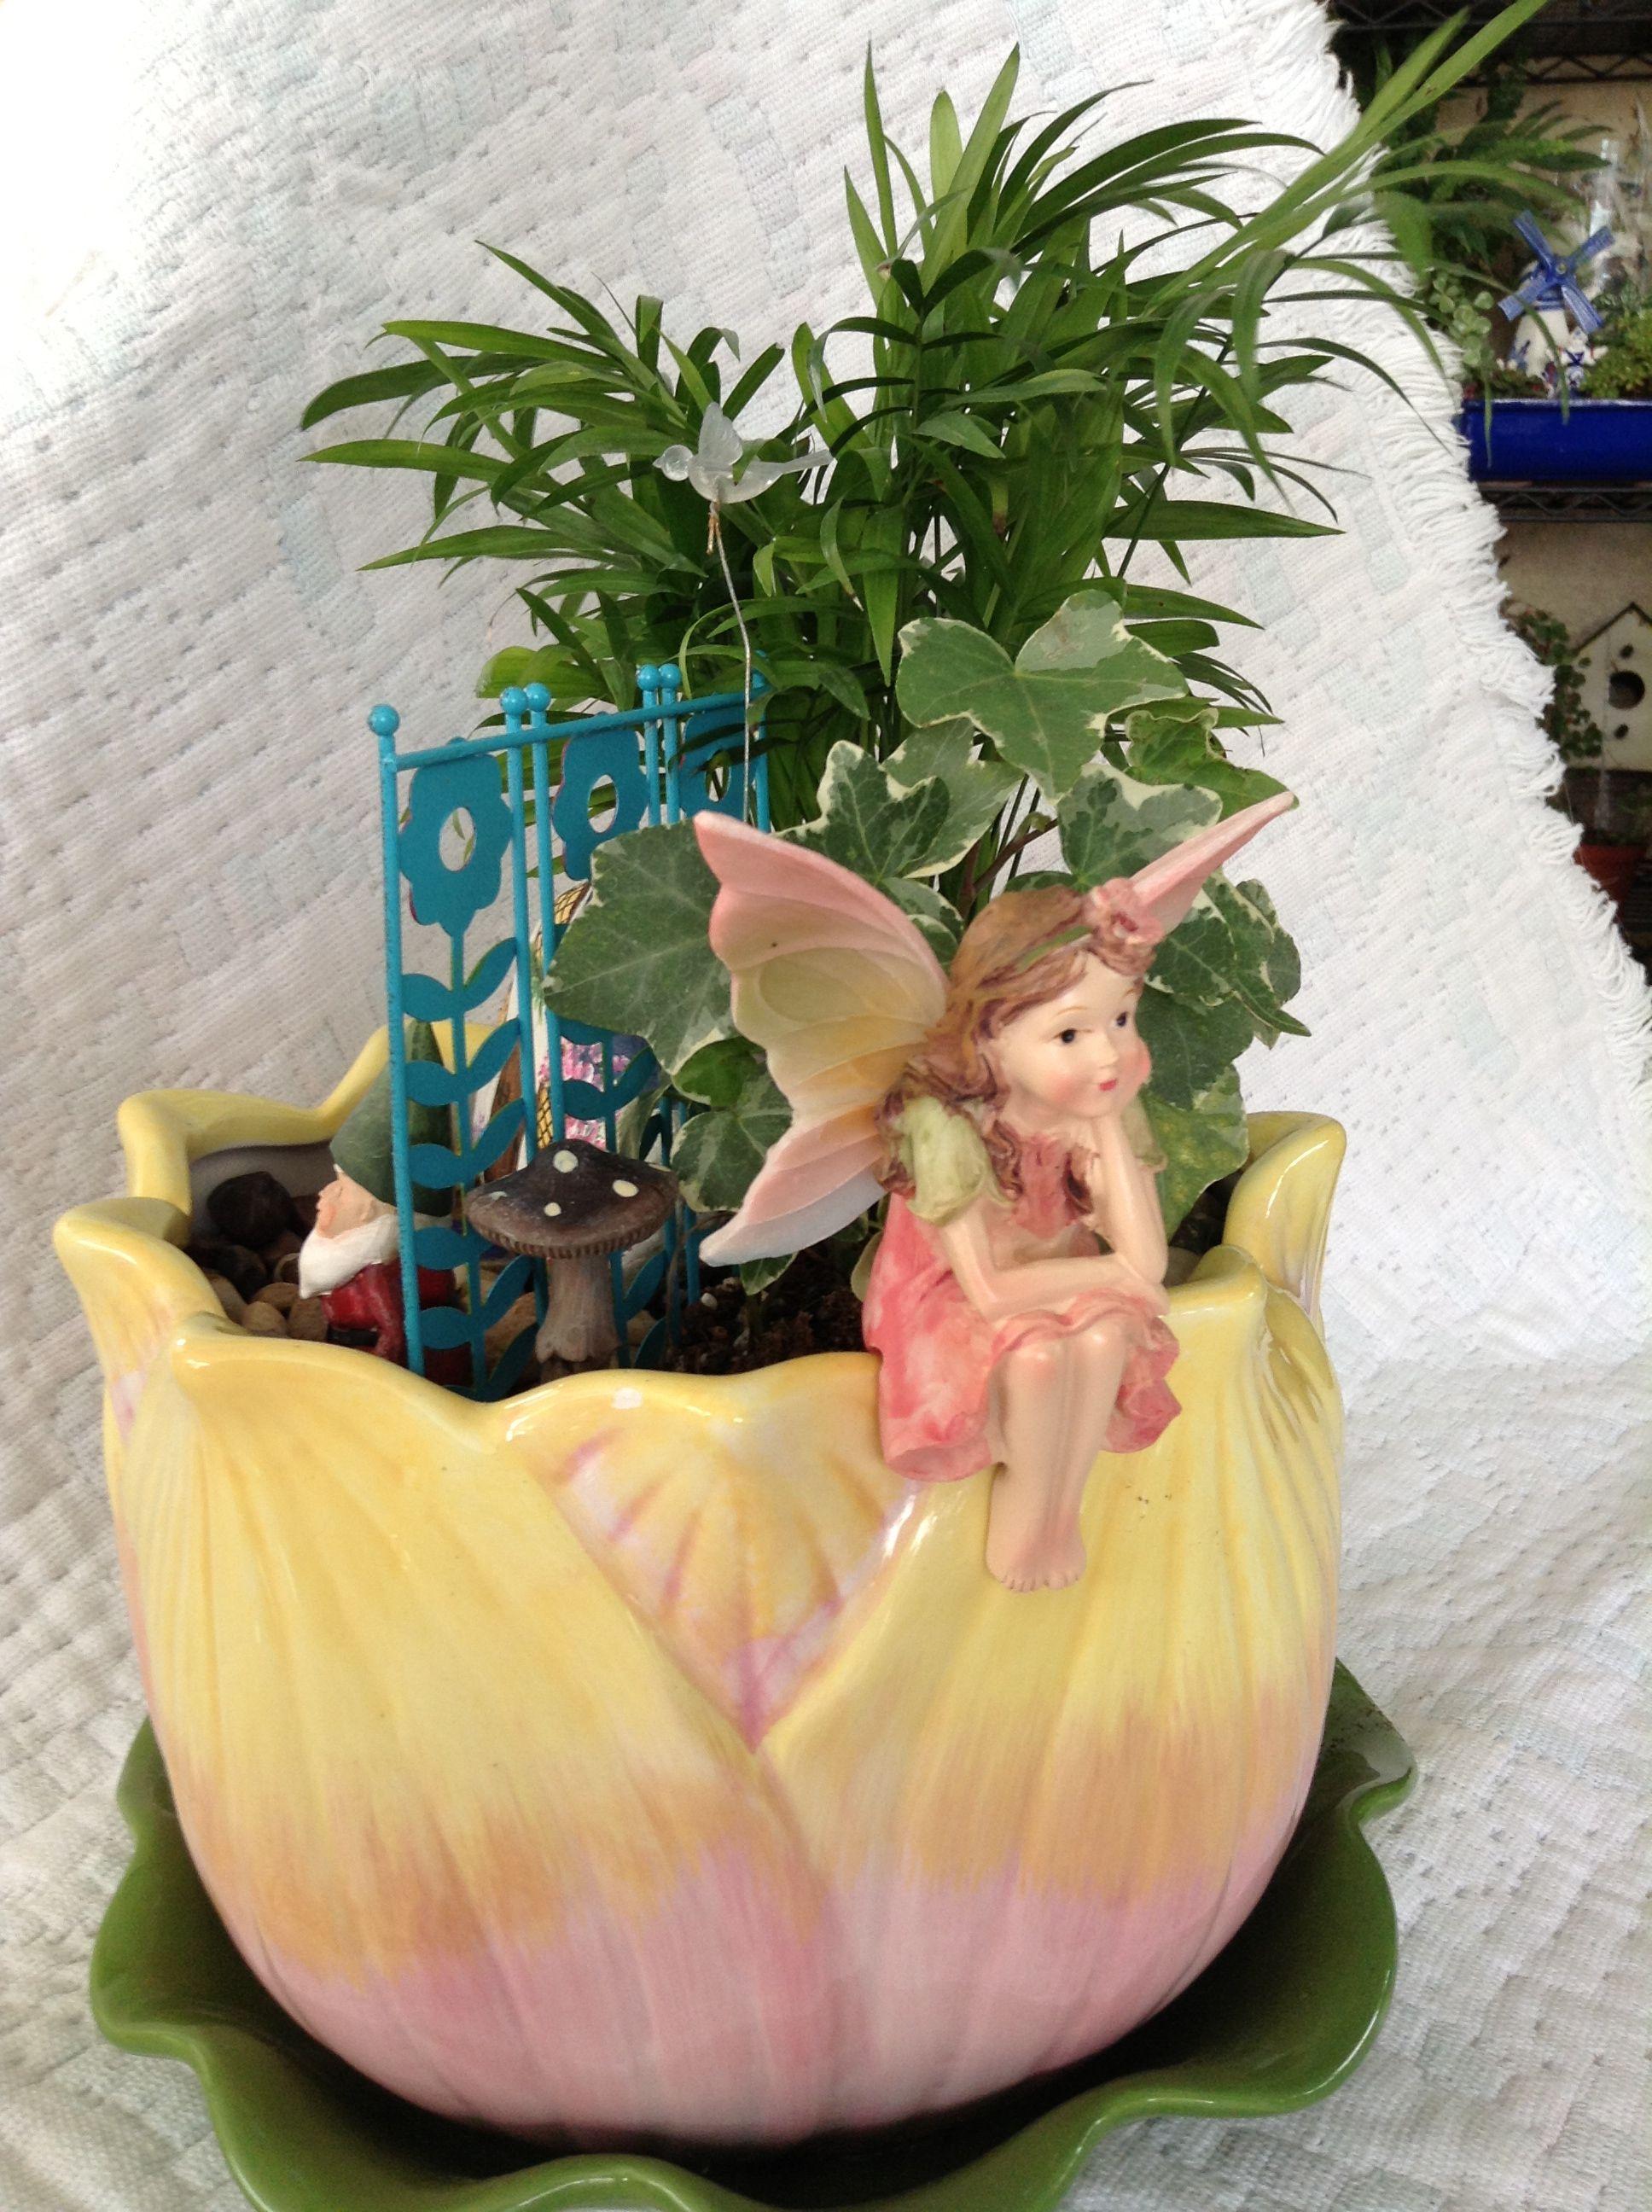 Fairy from joanns flower pot from walmart flower pots